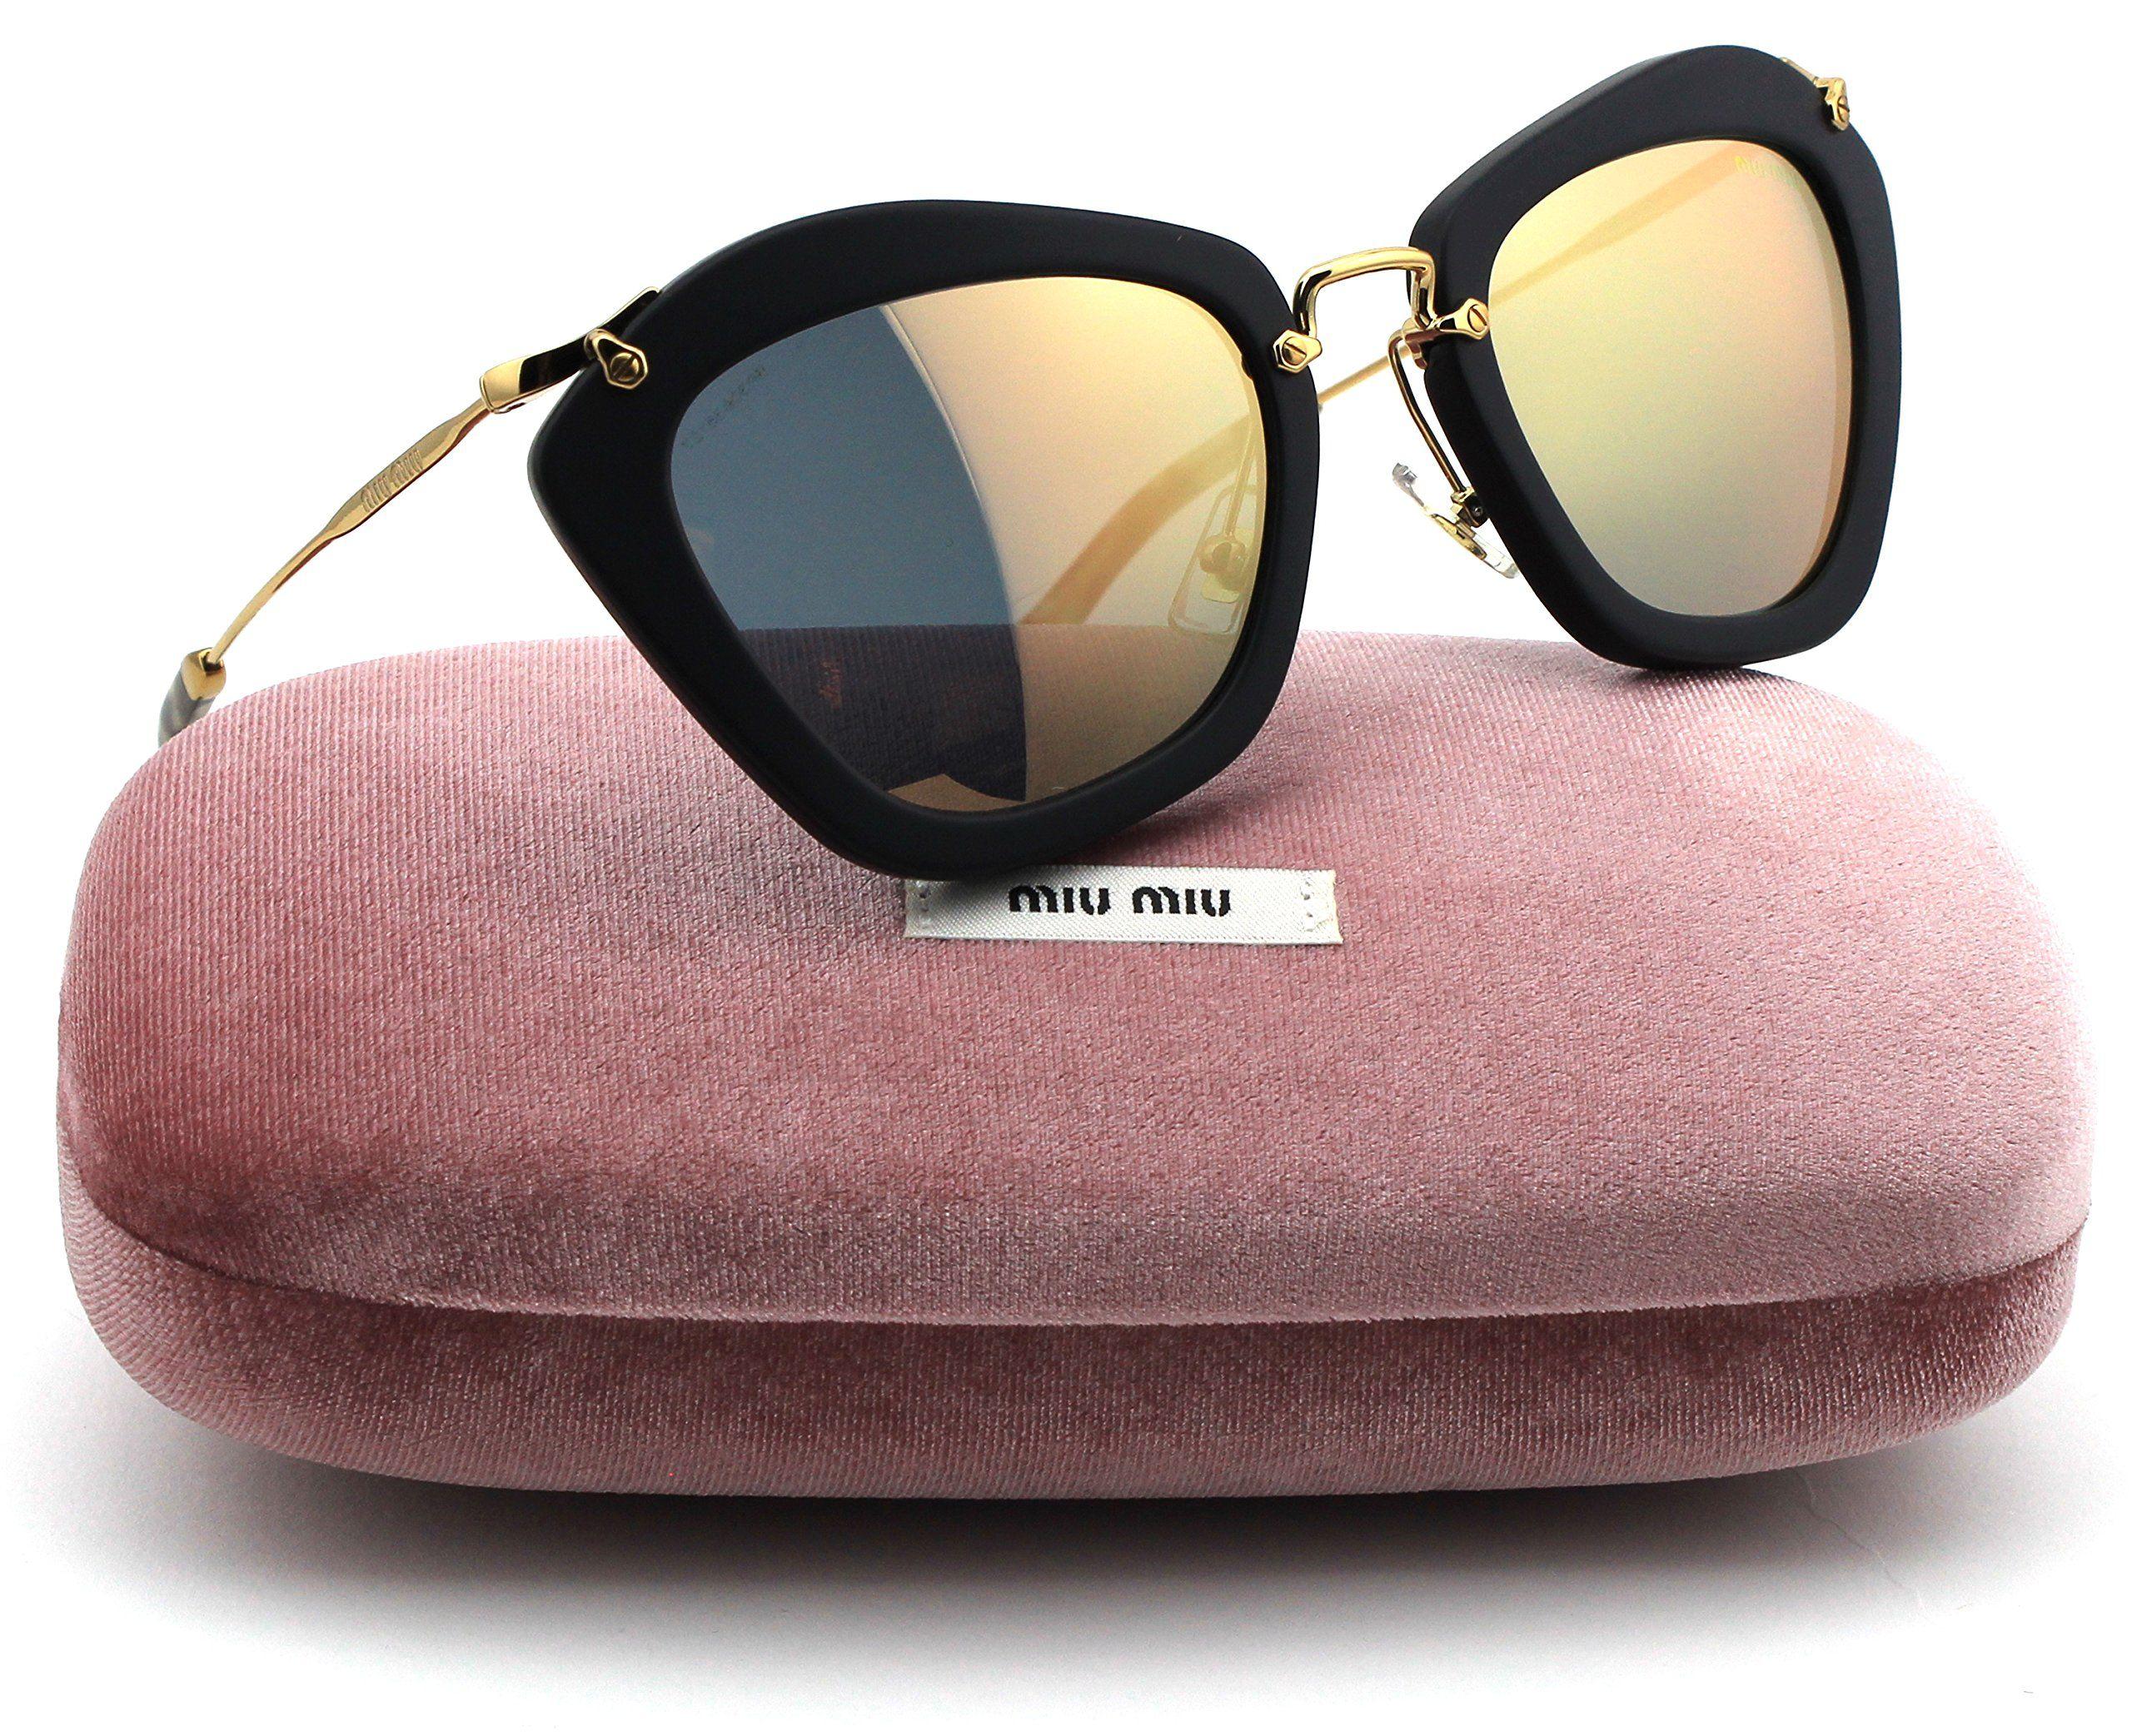 ba7d8279473e Miu Miu MU 10NS Noir Forties-Style Black Sand Frame   Grey Rose Gold  Mirrored Lens (1BO 2D2)